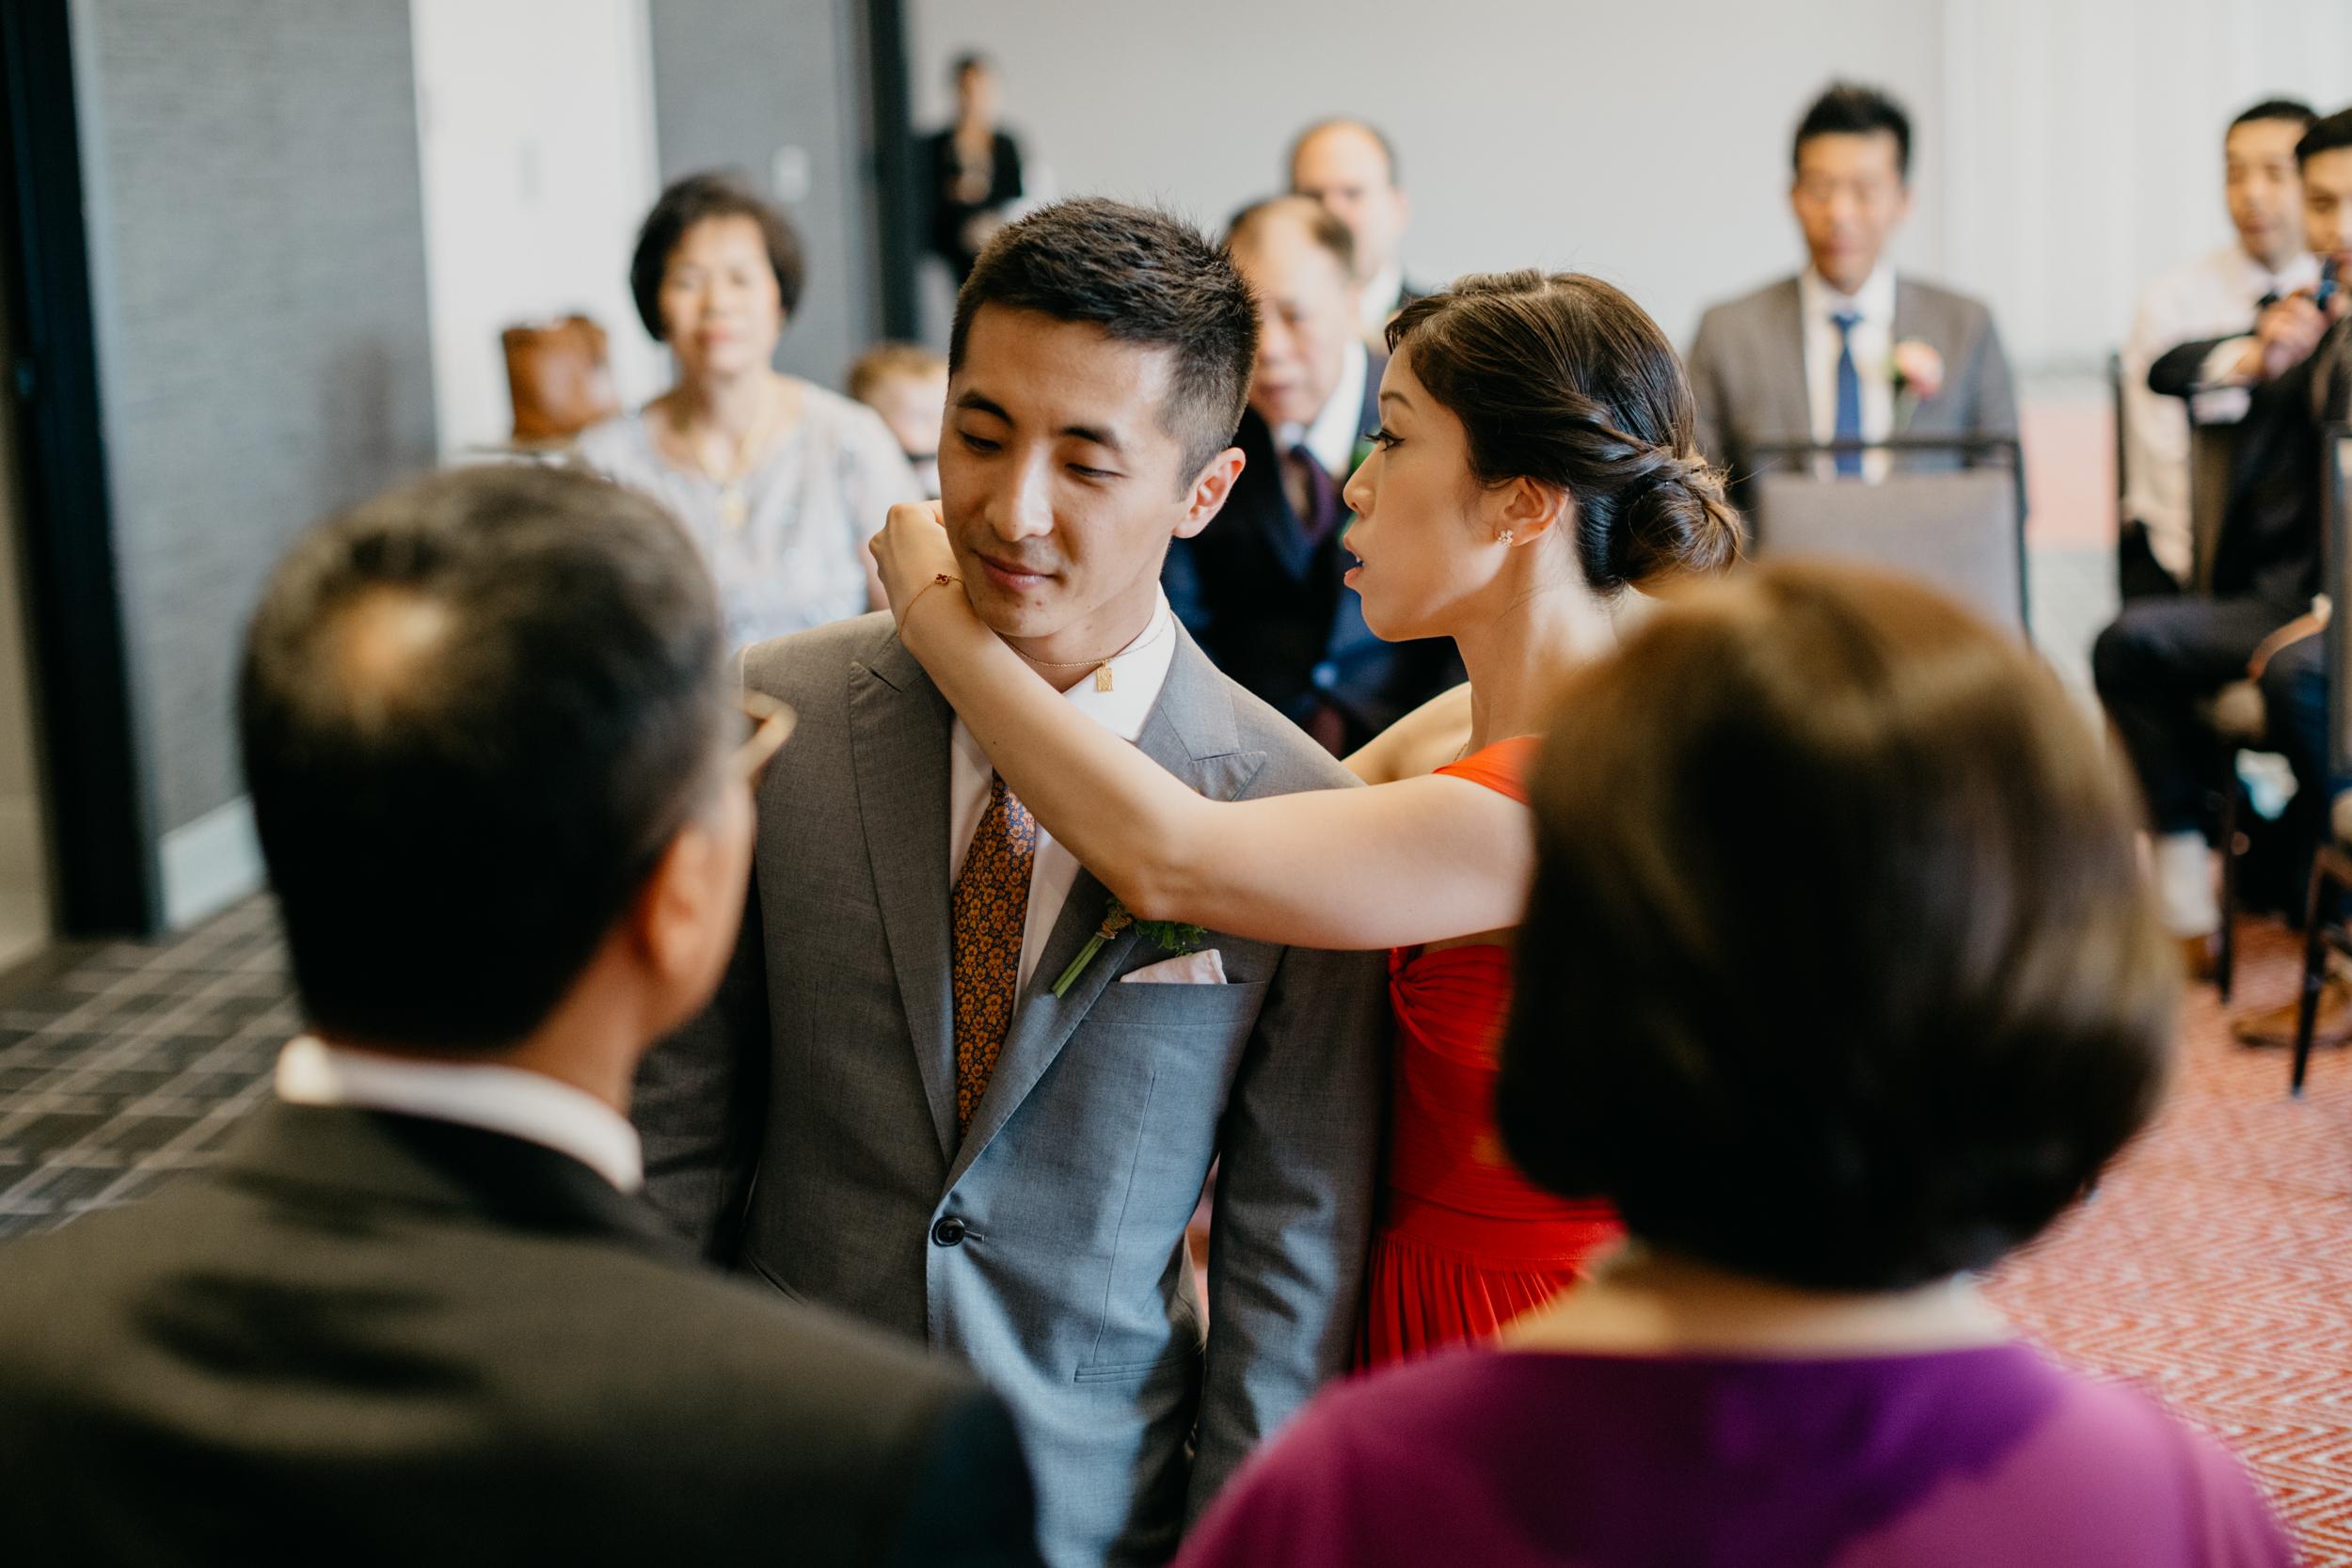 Mindy_Bo_Boston_Wedding_MIT_HotelCommonwealth_008.jpg